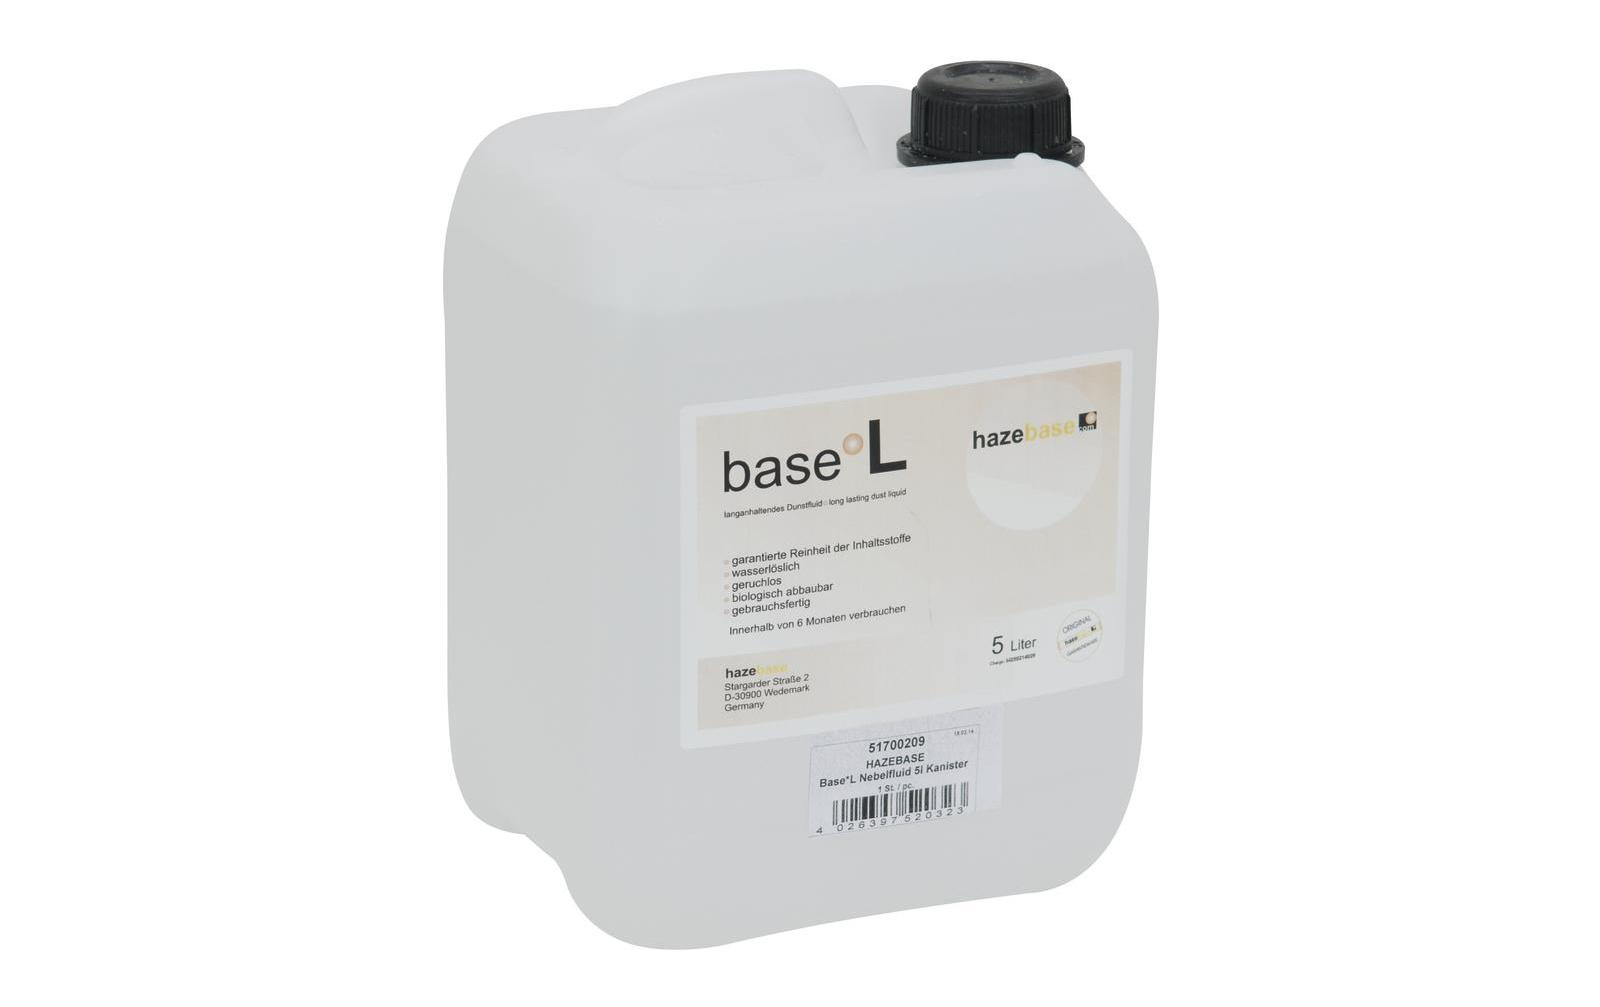 hazebase-base-l-nebelfluid-5l-kanister